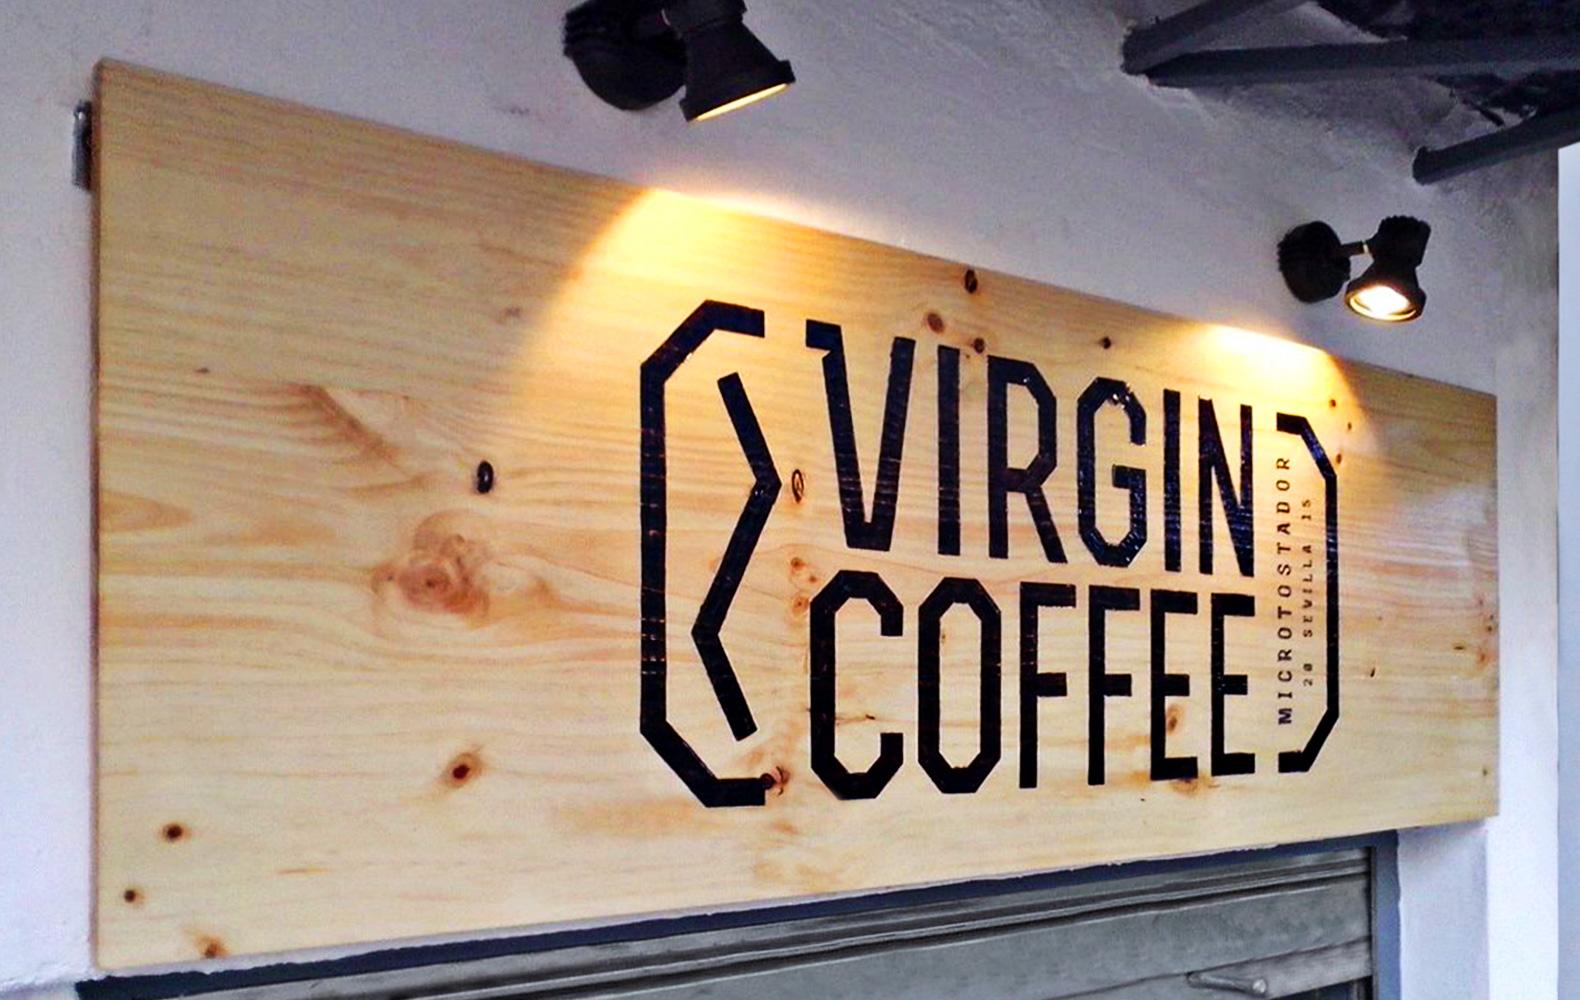 virgin coffee sevilla letrero puerta